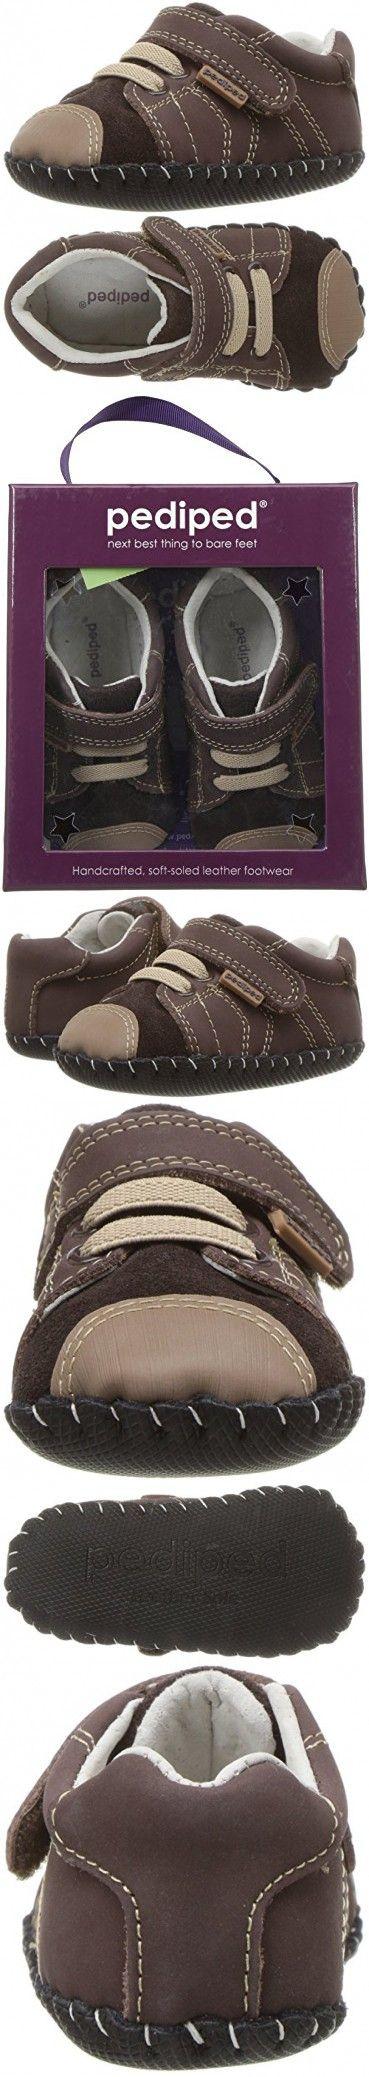 Pediped Baby Originals Jake Crib Shoe, Chocolate, 12-18 Months EU Infant (5-5.5 US)